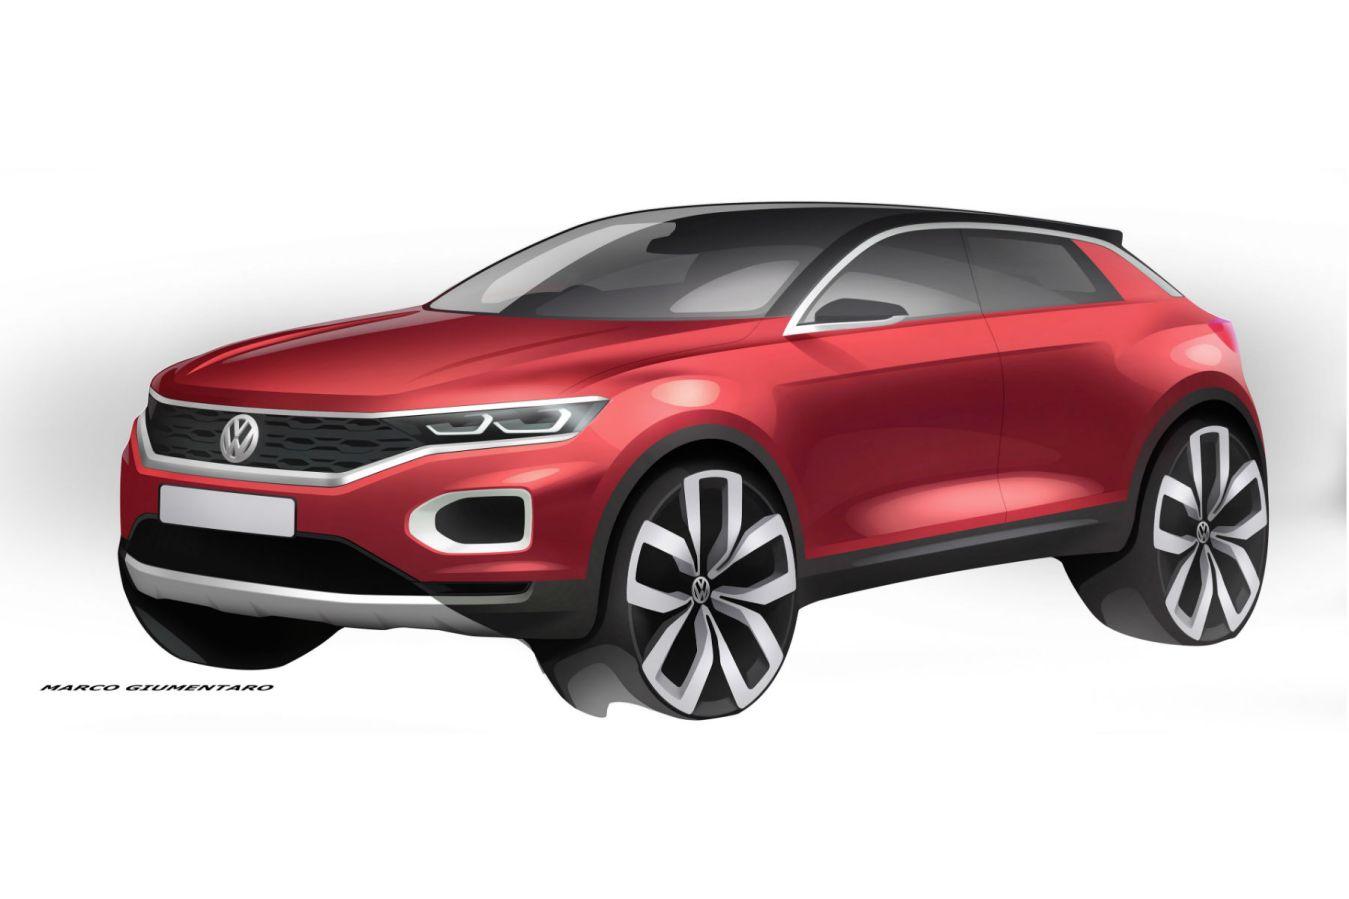 Volkswagen T-Roc teased ahead of next week's debut